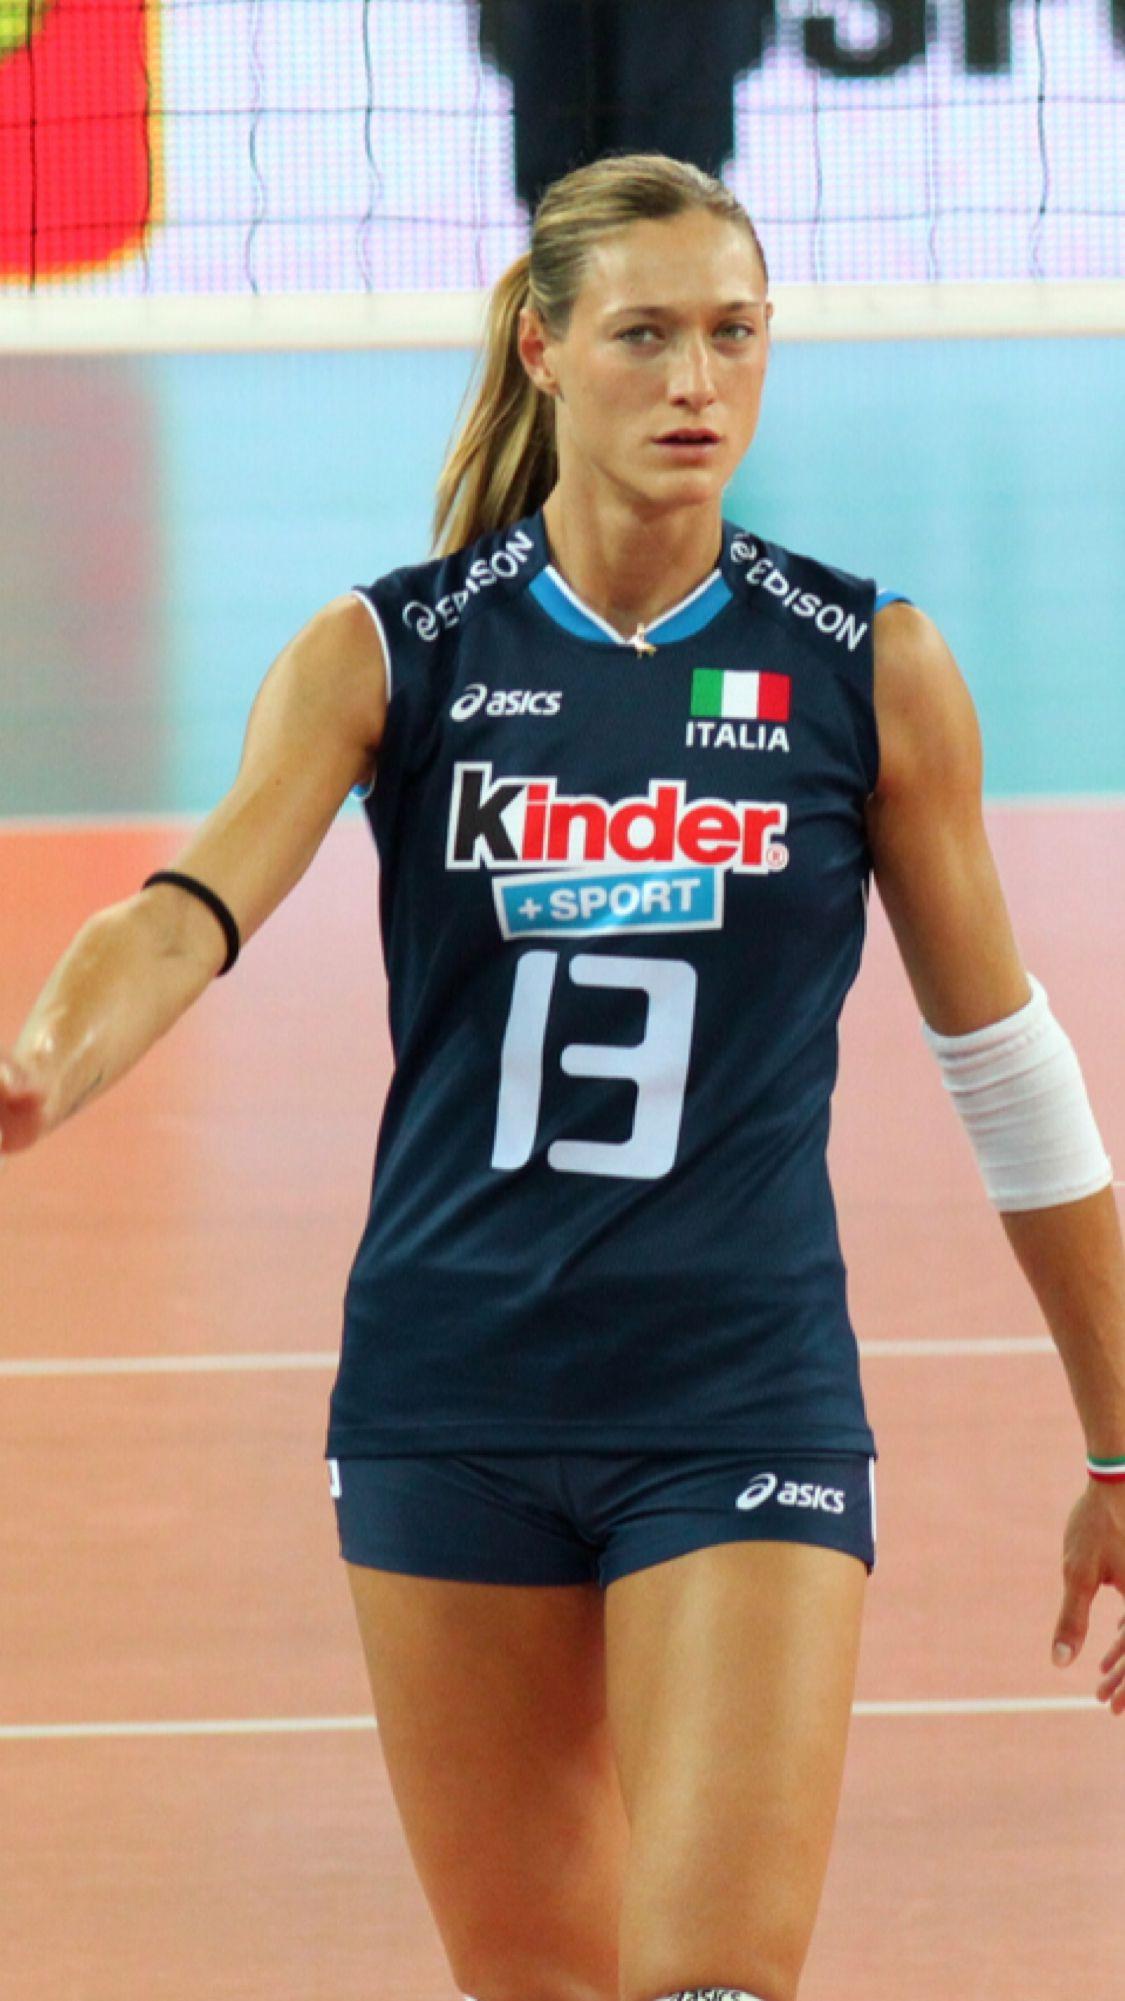 Pin De Mannhar Kaur Em Volleyball Beauties And Beasts Volei Feminino Desporto Feminino Mulheres Atleticas